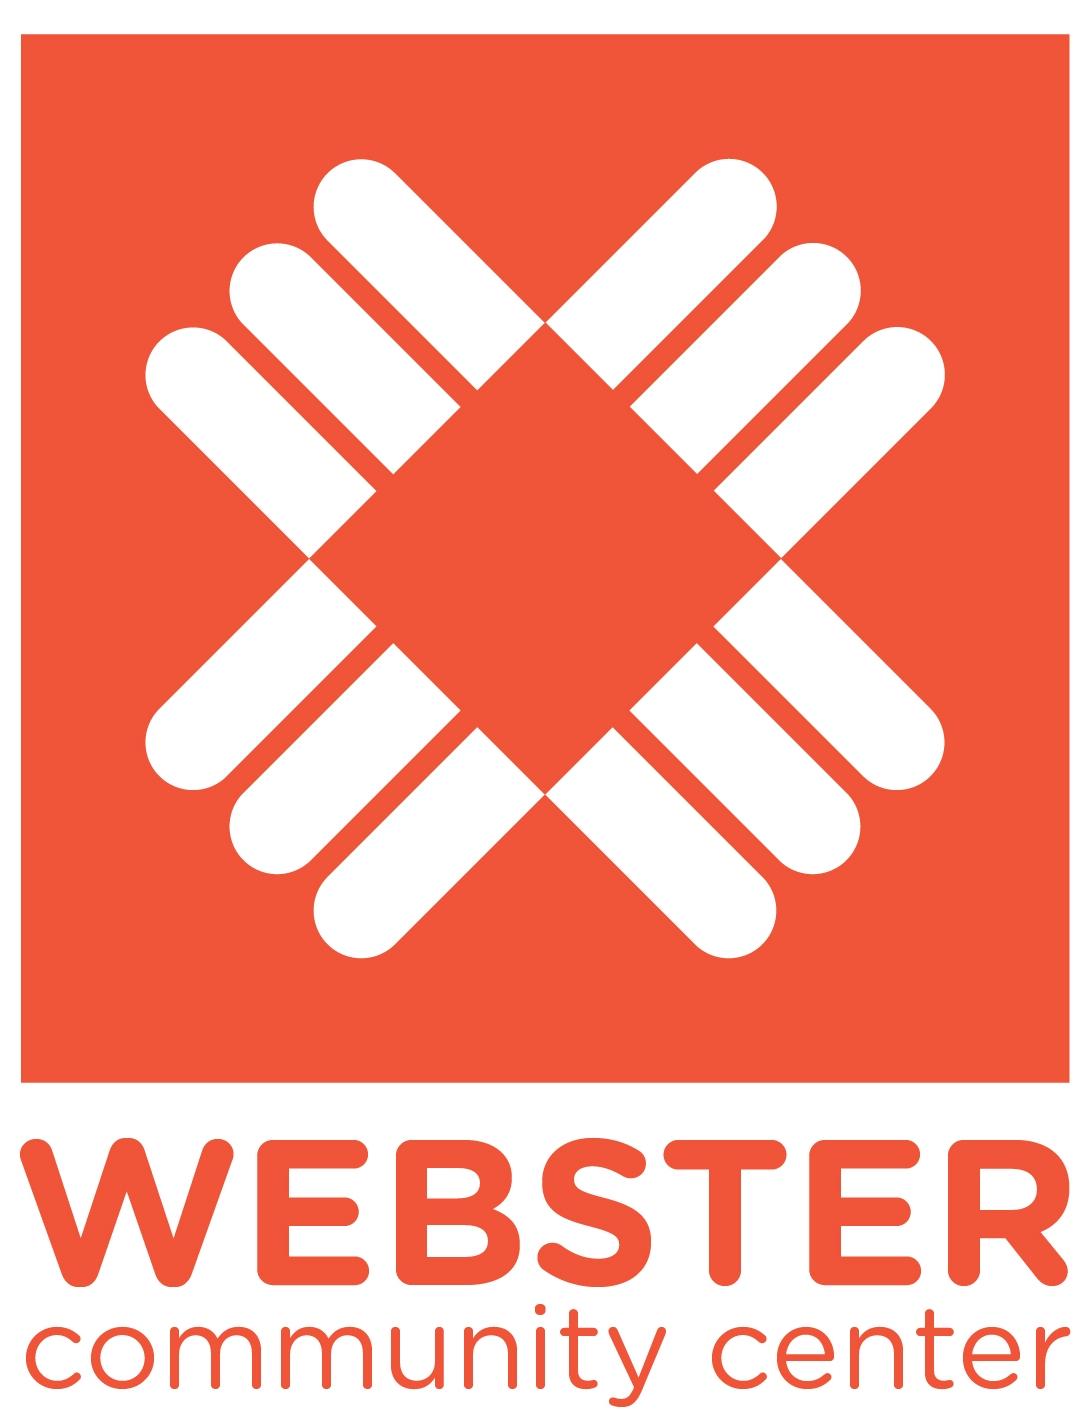 Webster Community Center logo designed by Piper Lehto, Zak Plaxton and Elizabeth Suchocki.